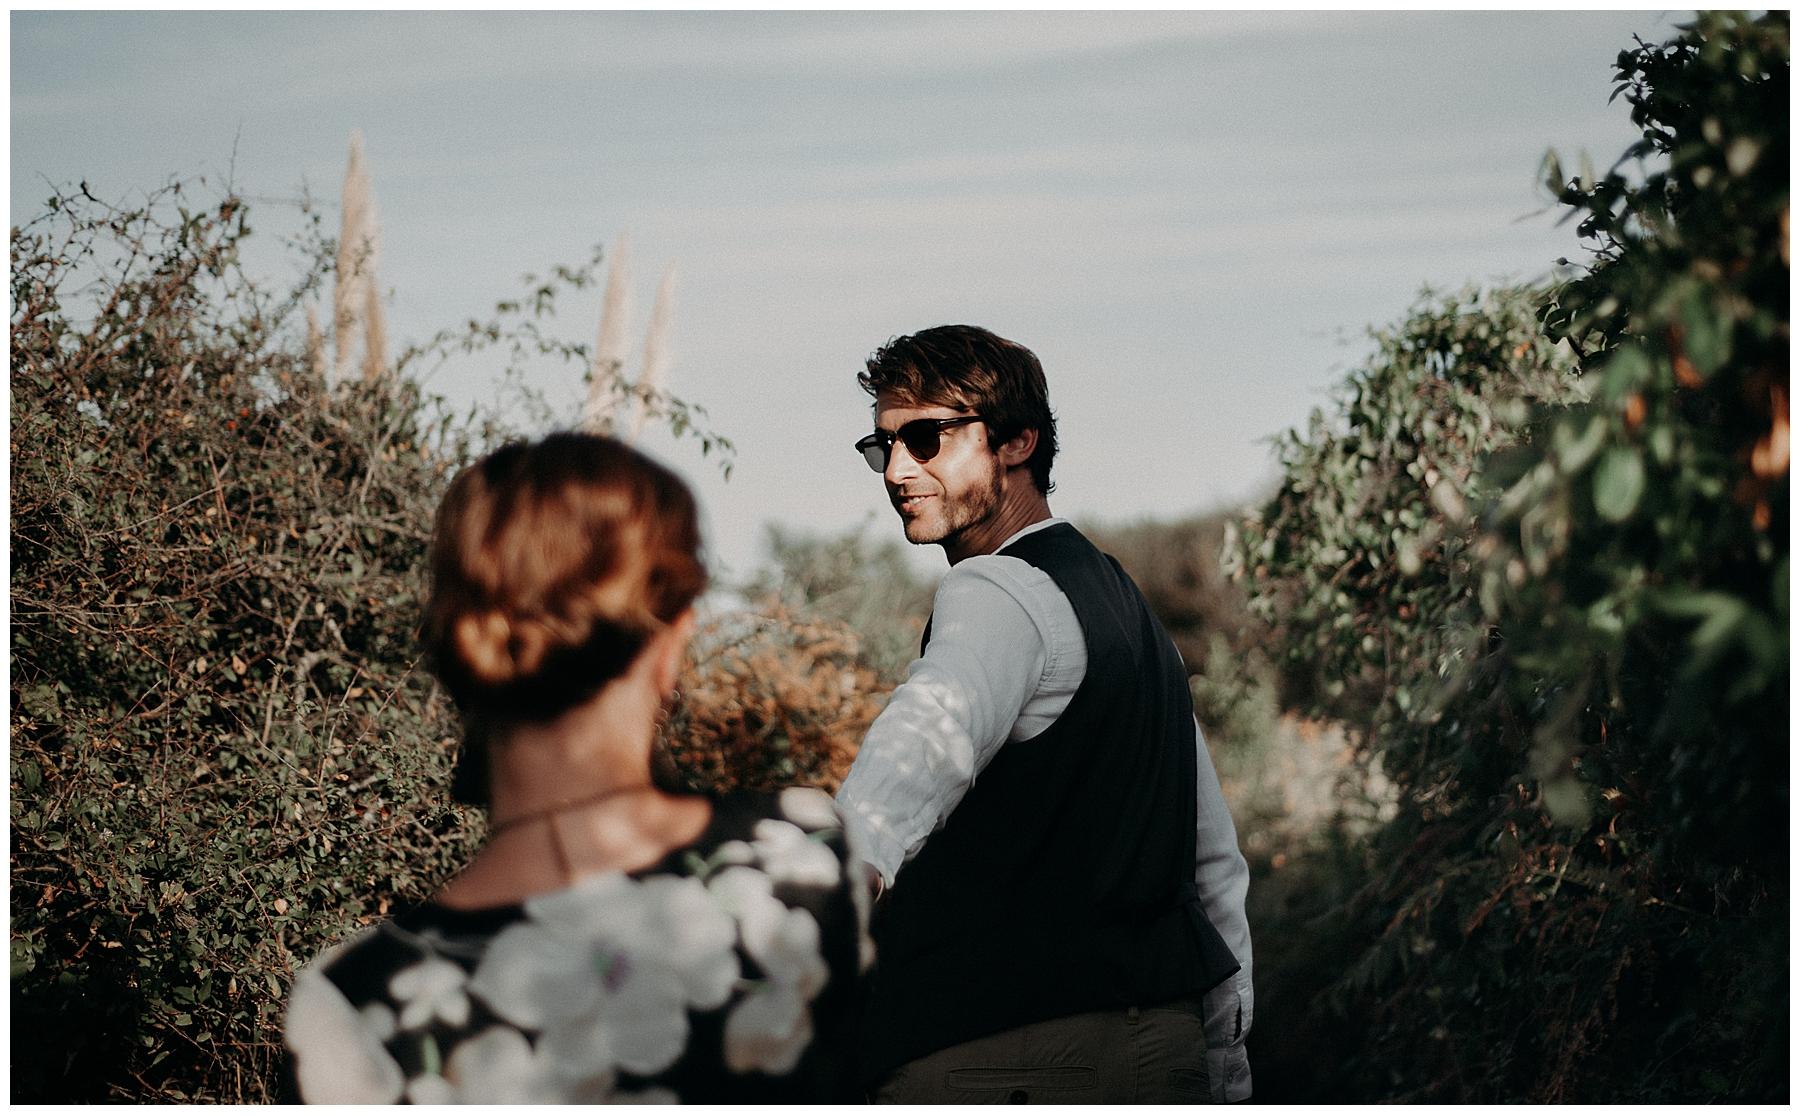 photographe mariage bordeaux, couple en balade